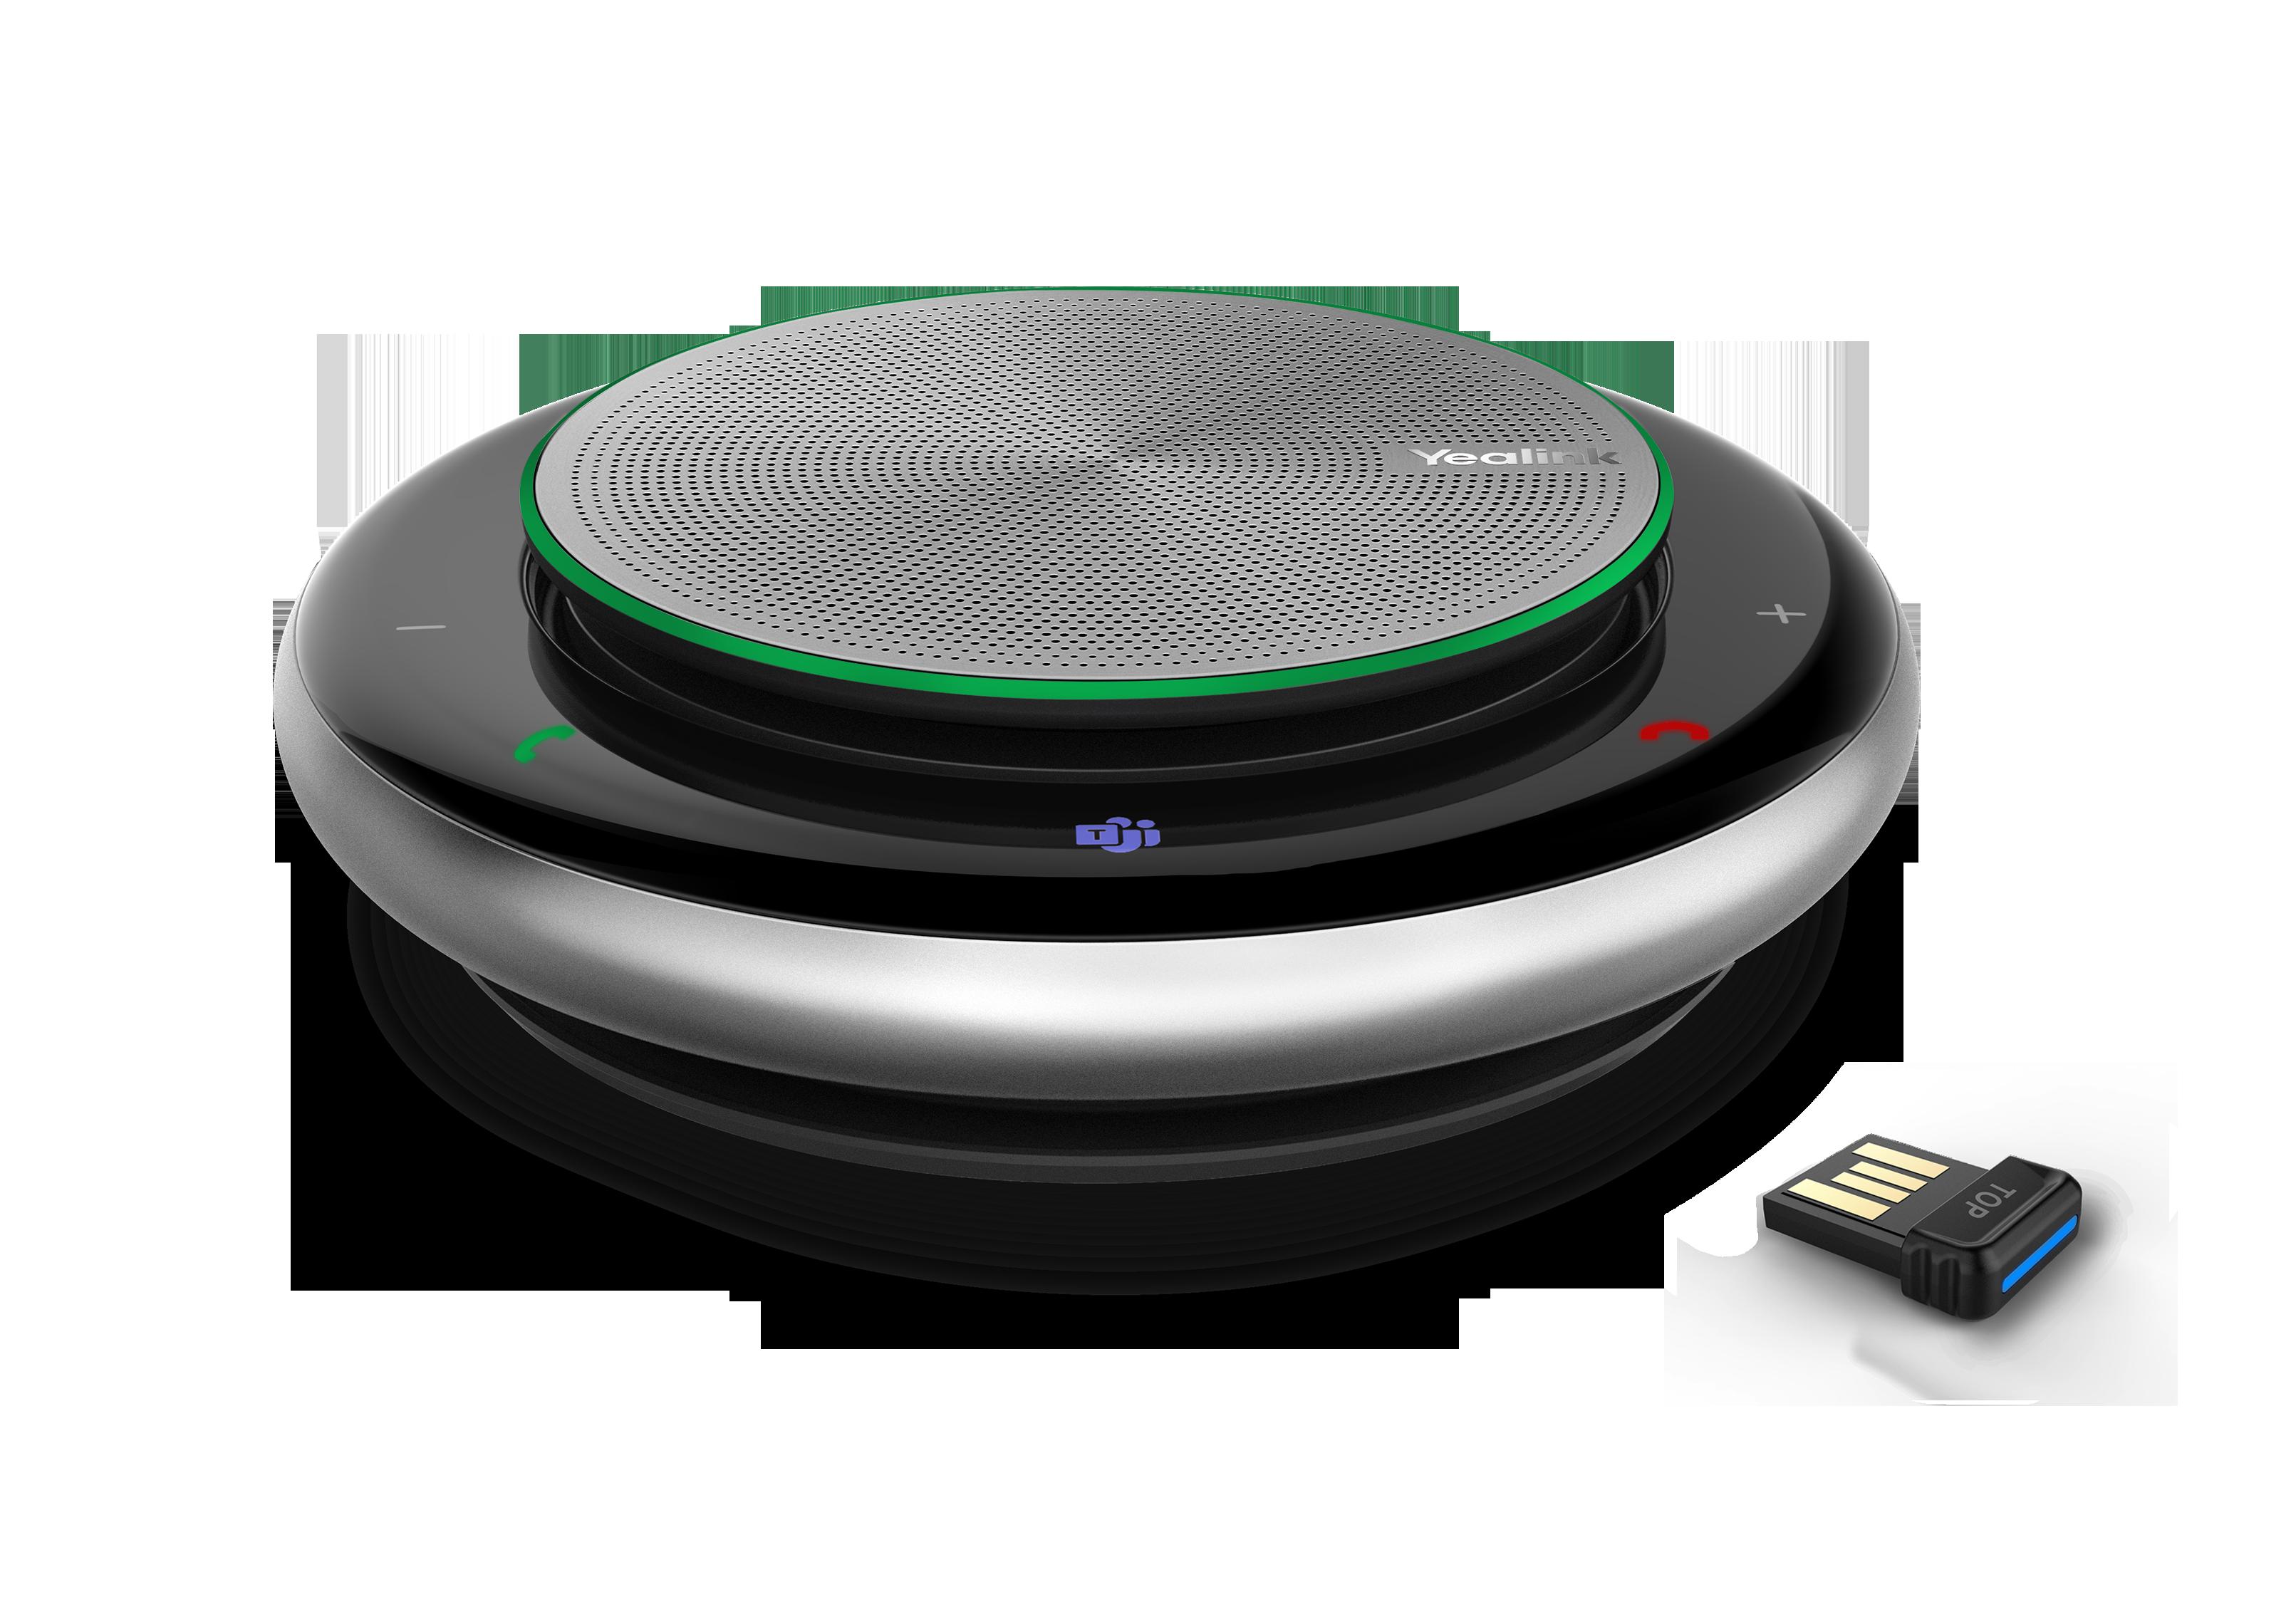 YEALINK Yealink CP900-BT50 - Haut-parleur personnel certifié Microsoft Teams